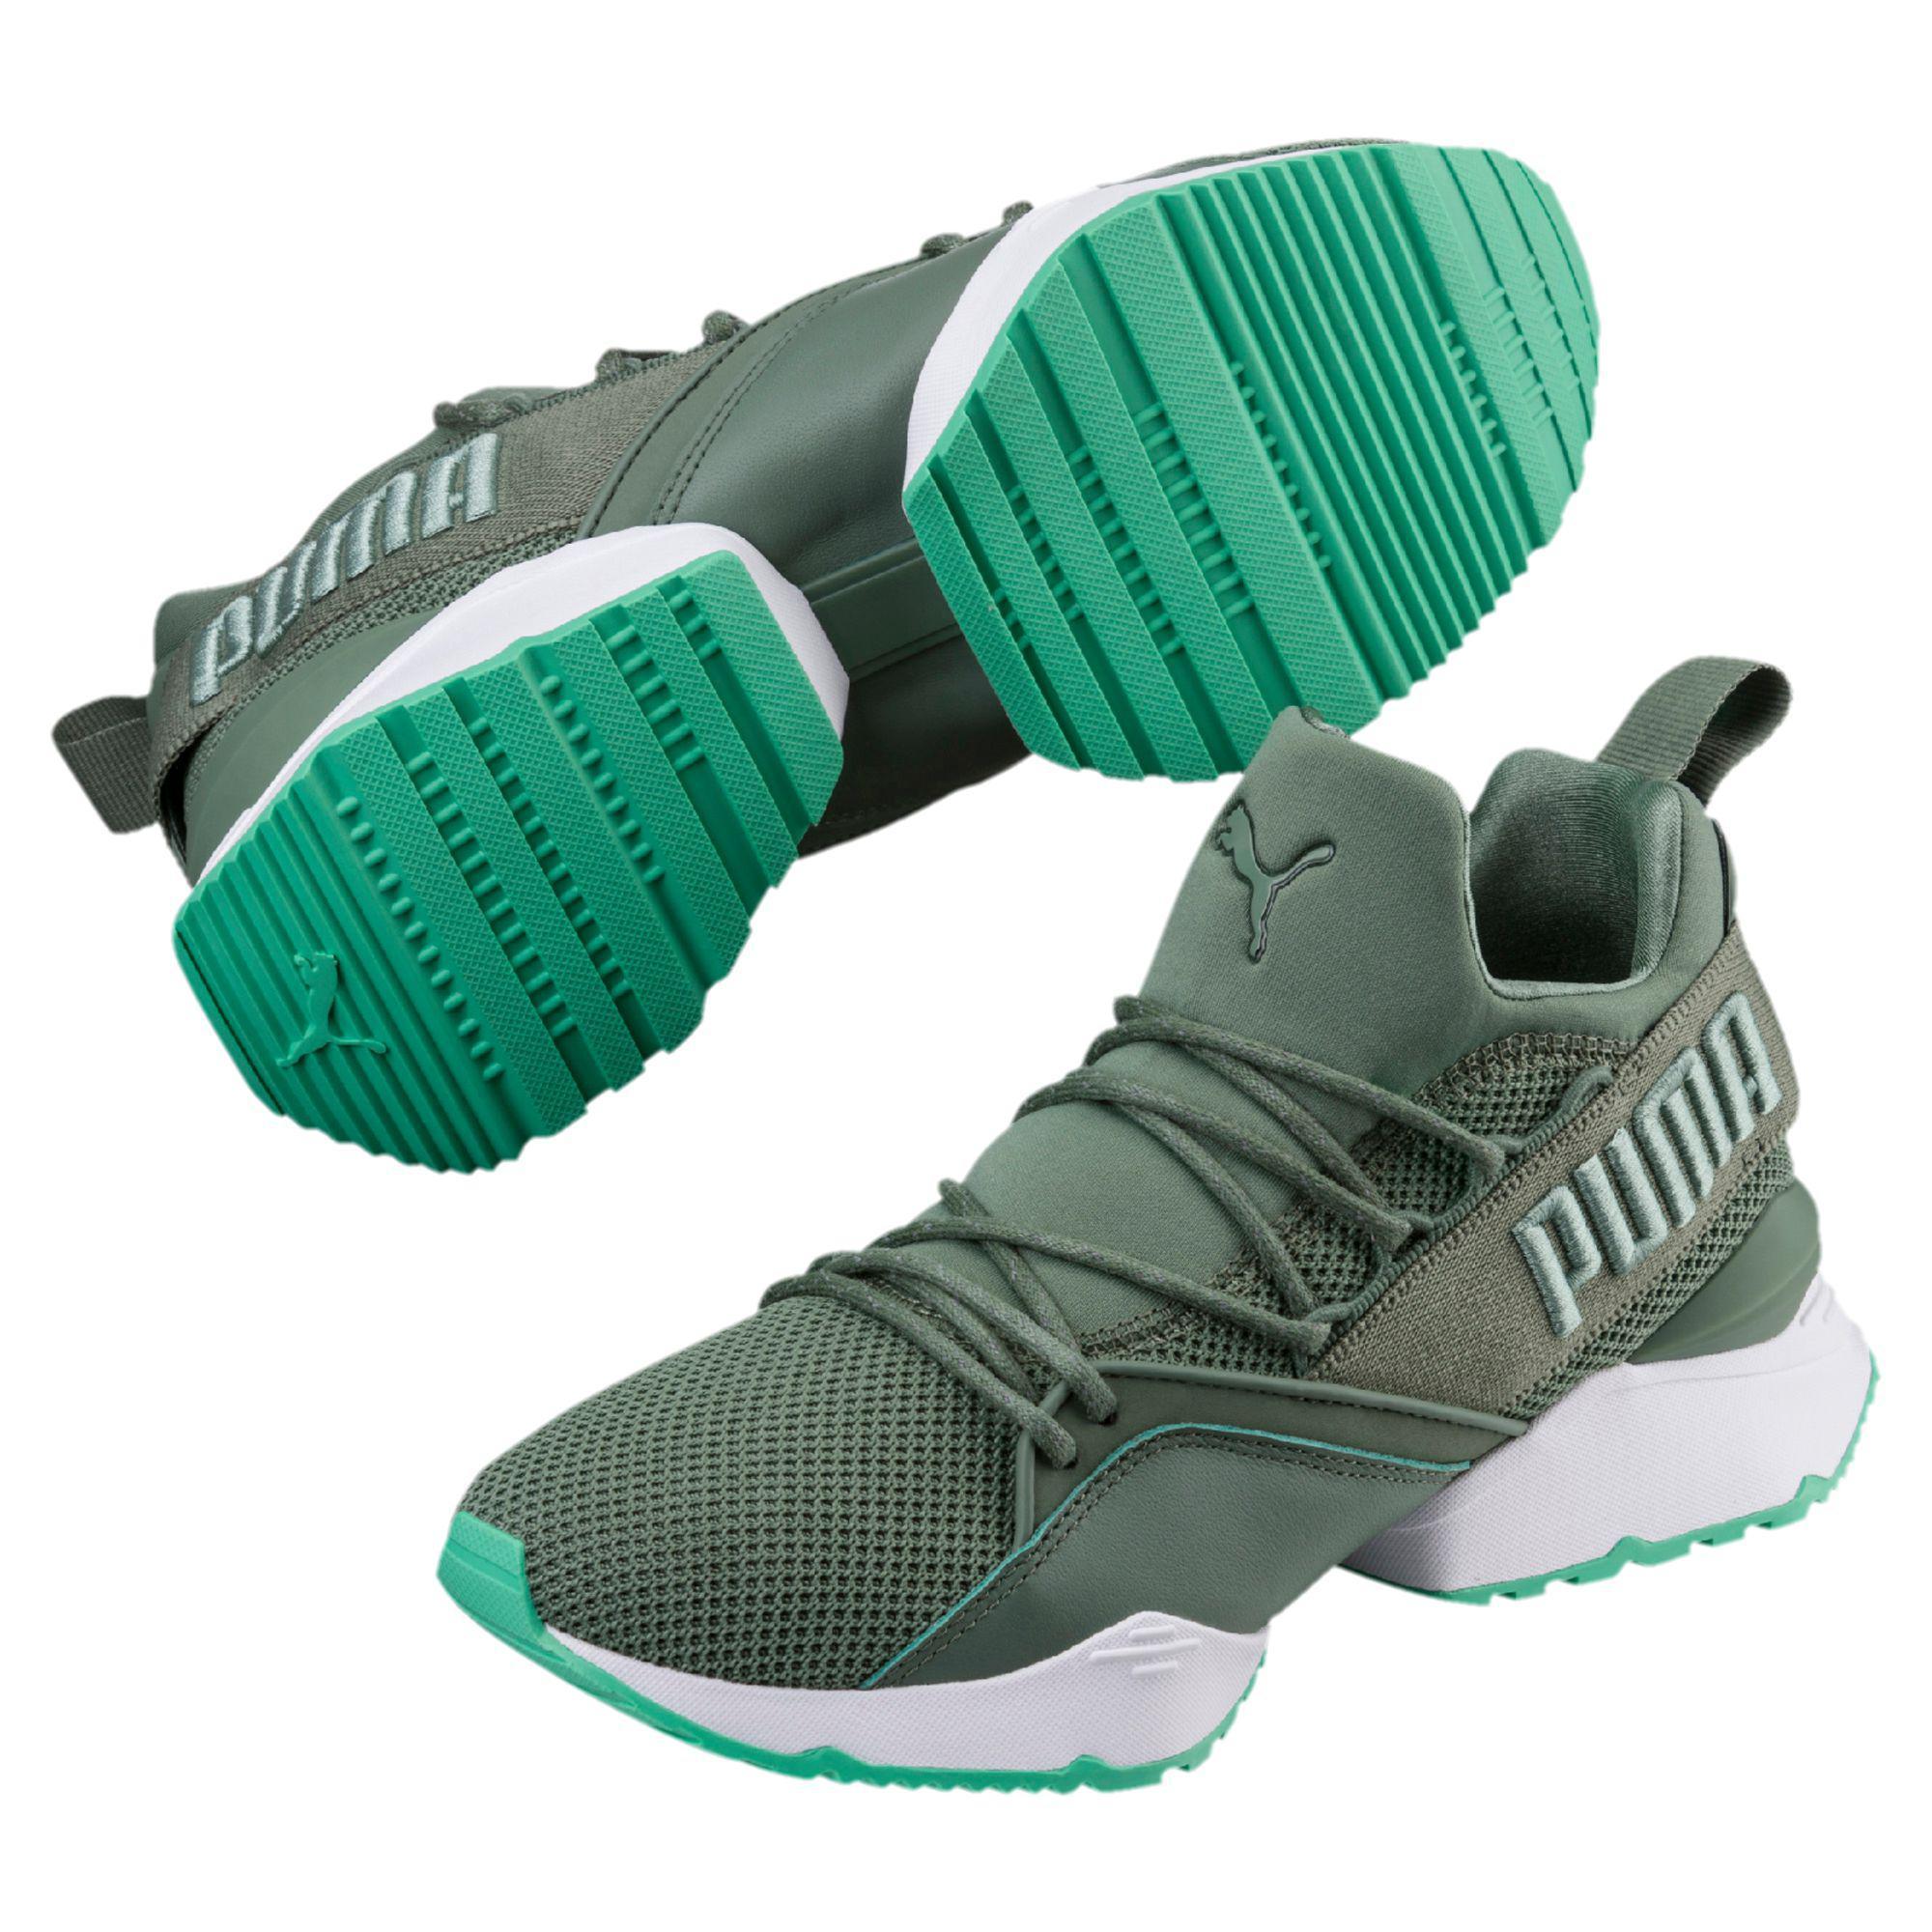 f86e3c3bd26 PUMA - Green Muse Maia Street 2 Women s Sneakers - Lyst. View fullscreen